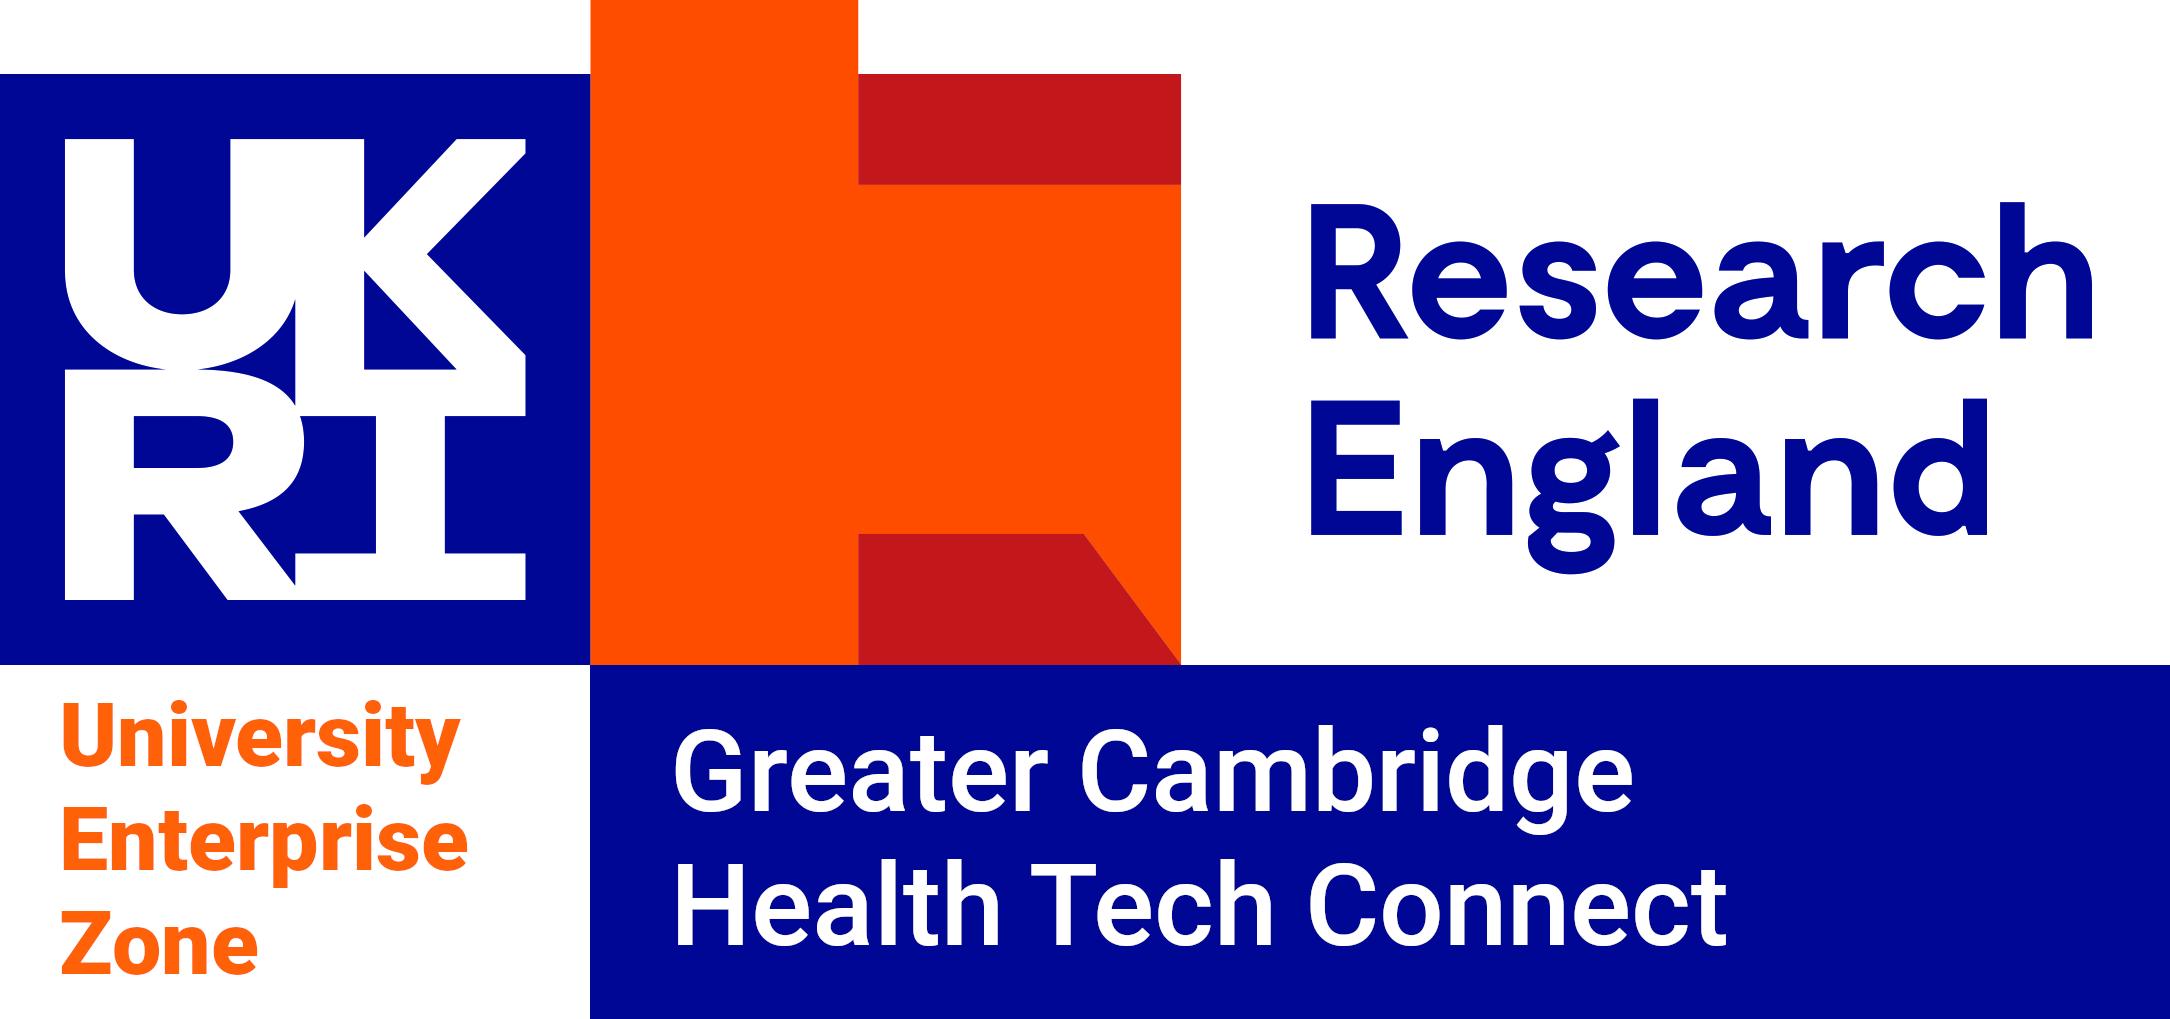 Greater Cambridge Health Tech Connect UEZ